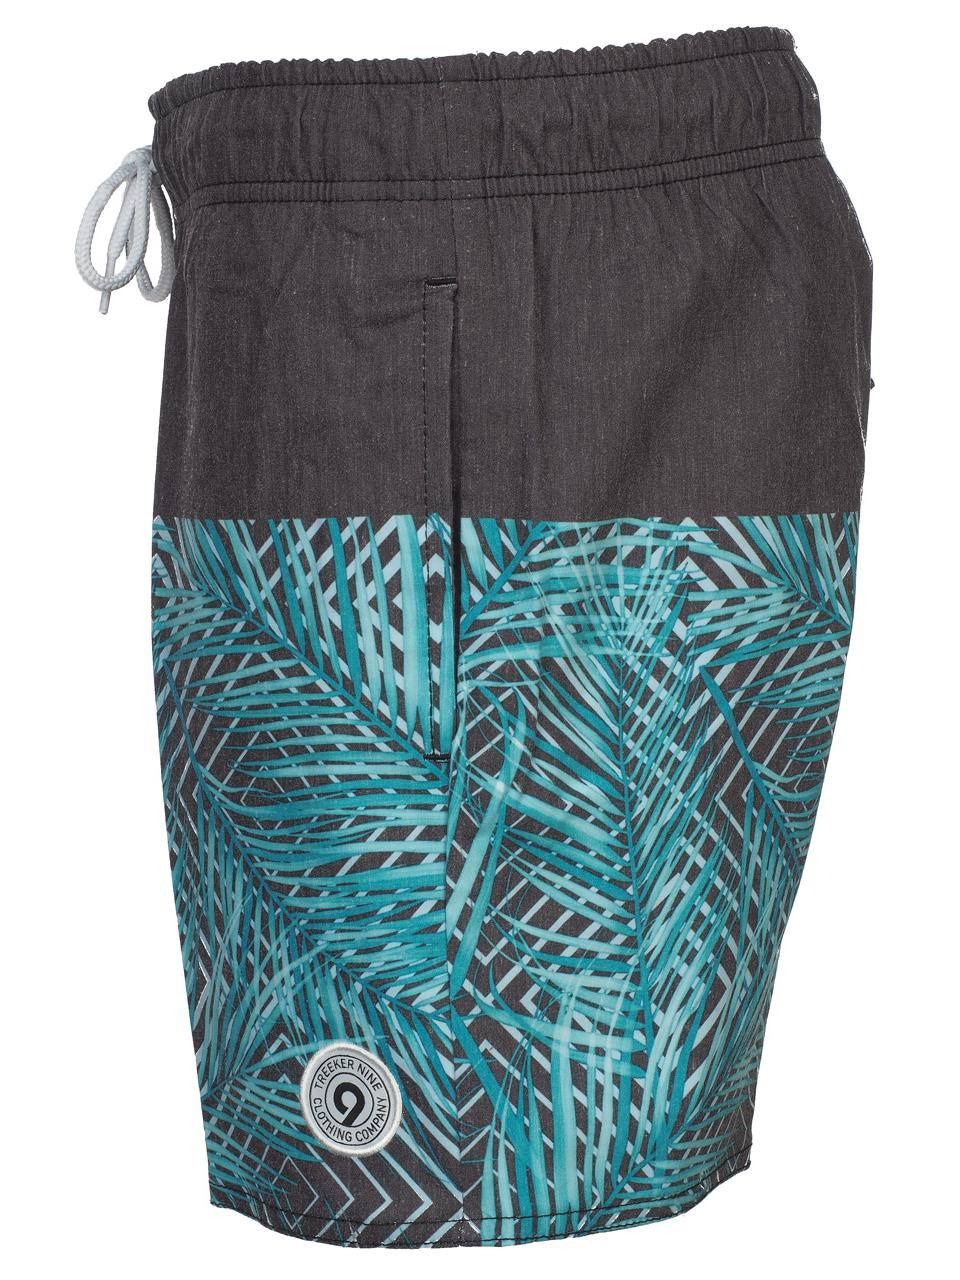 Swimming-Shorts-Treeker9-Agosta-Bath-H-Blue-77749-New thumbnail 2